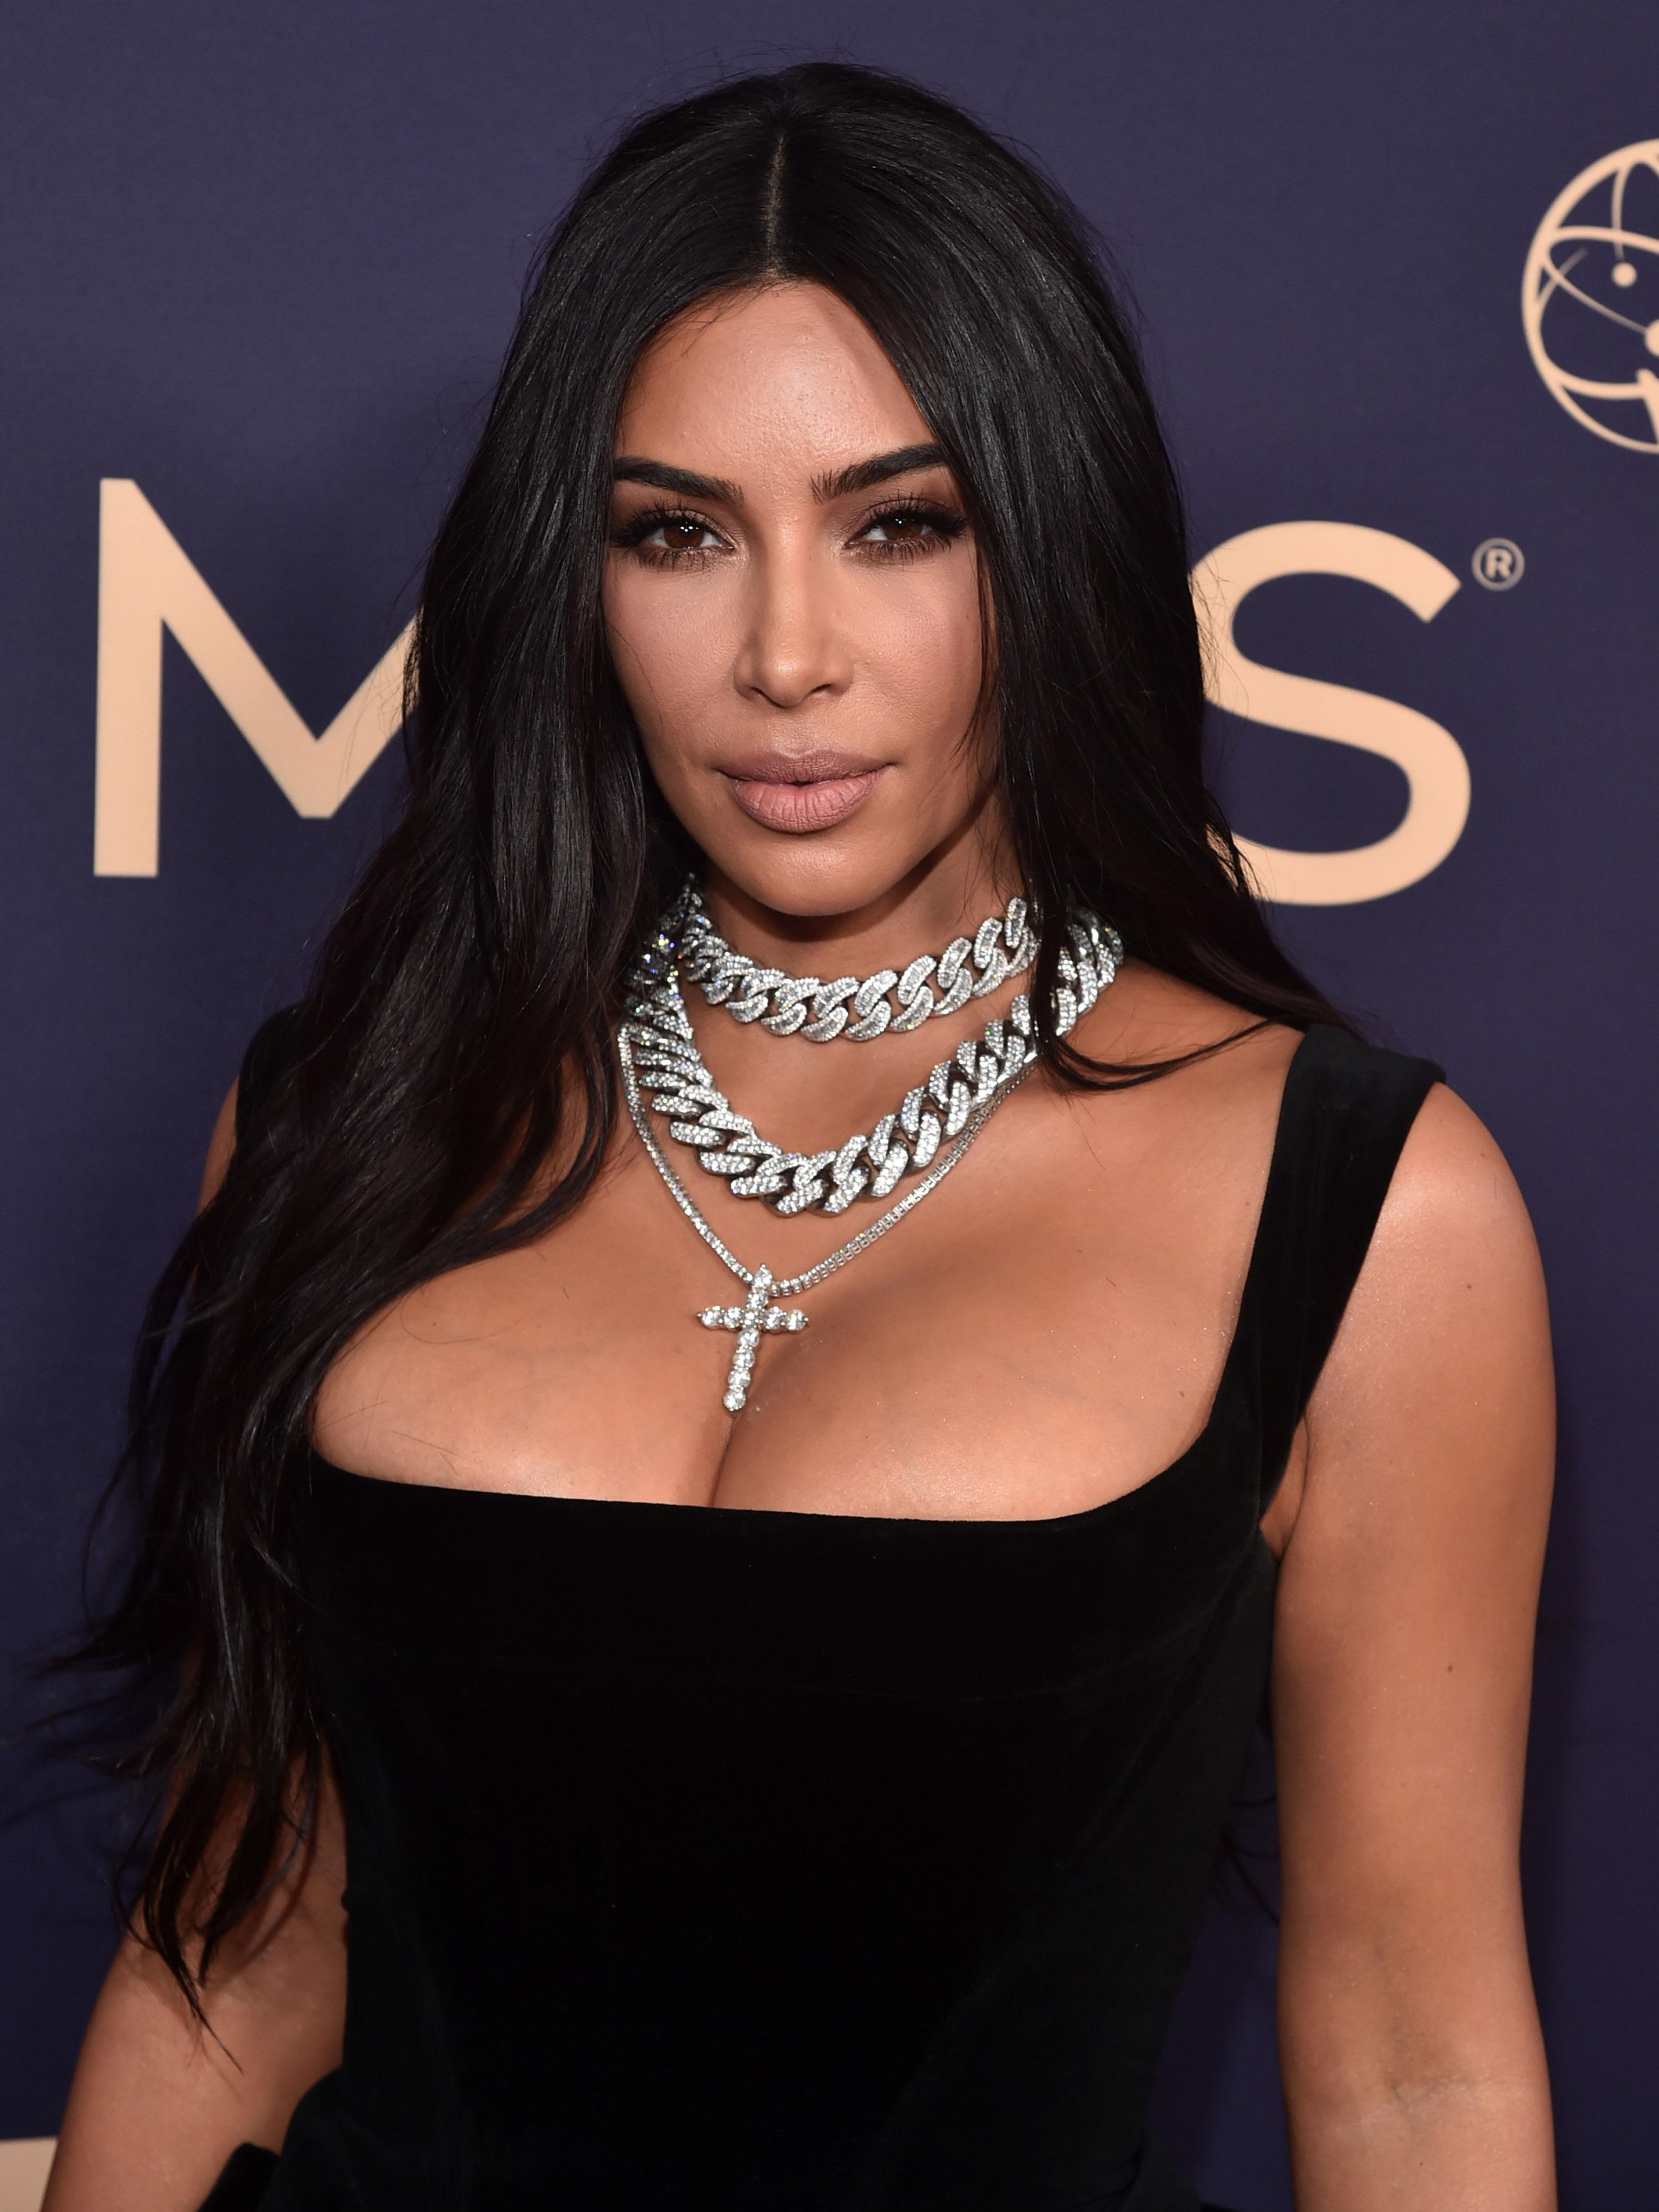 Kim Kardashian shares terrifying details of being held at gunpoint in Paris robbery